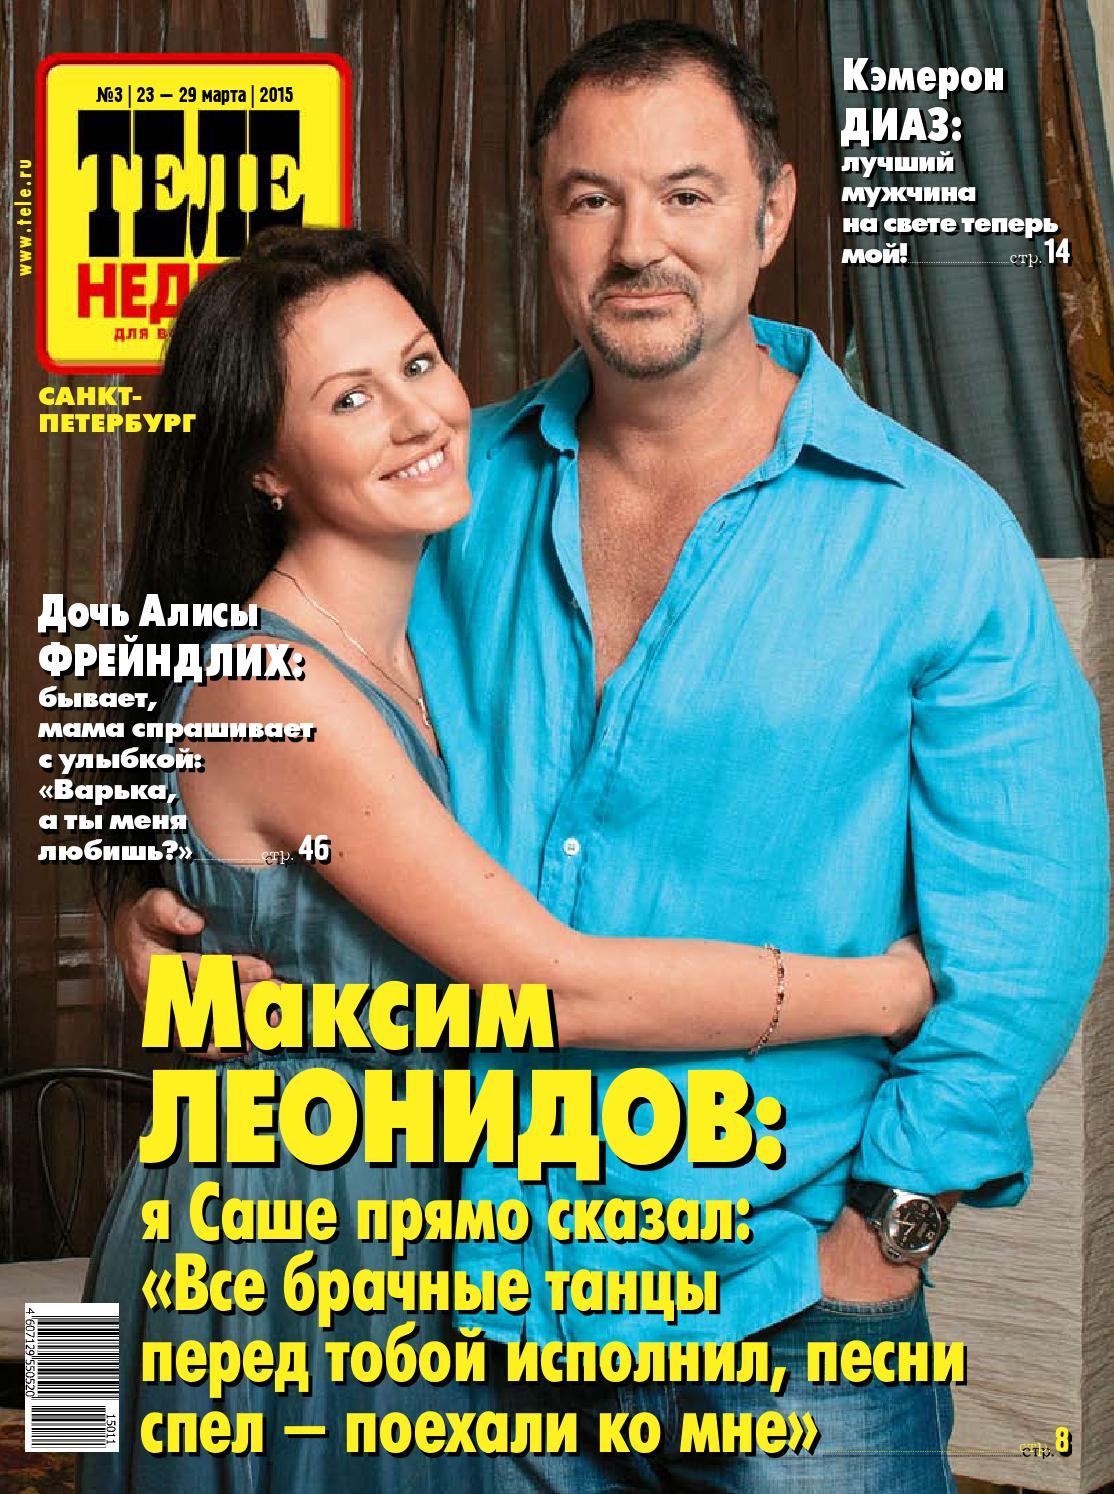 Типа копы (2014) The-Cinema.RU –